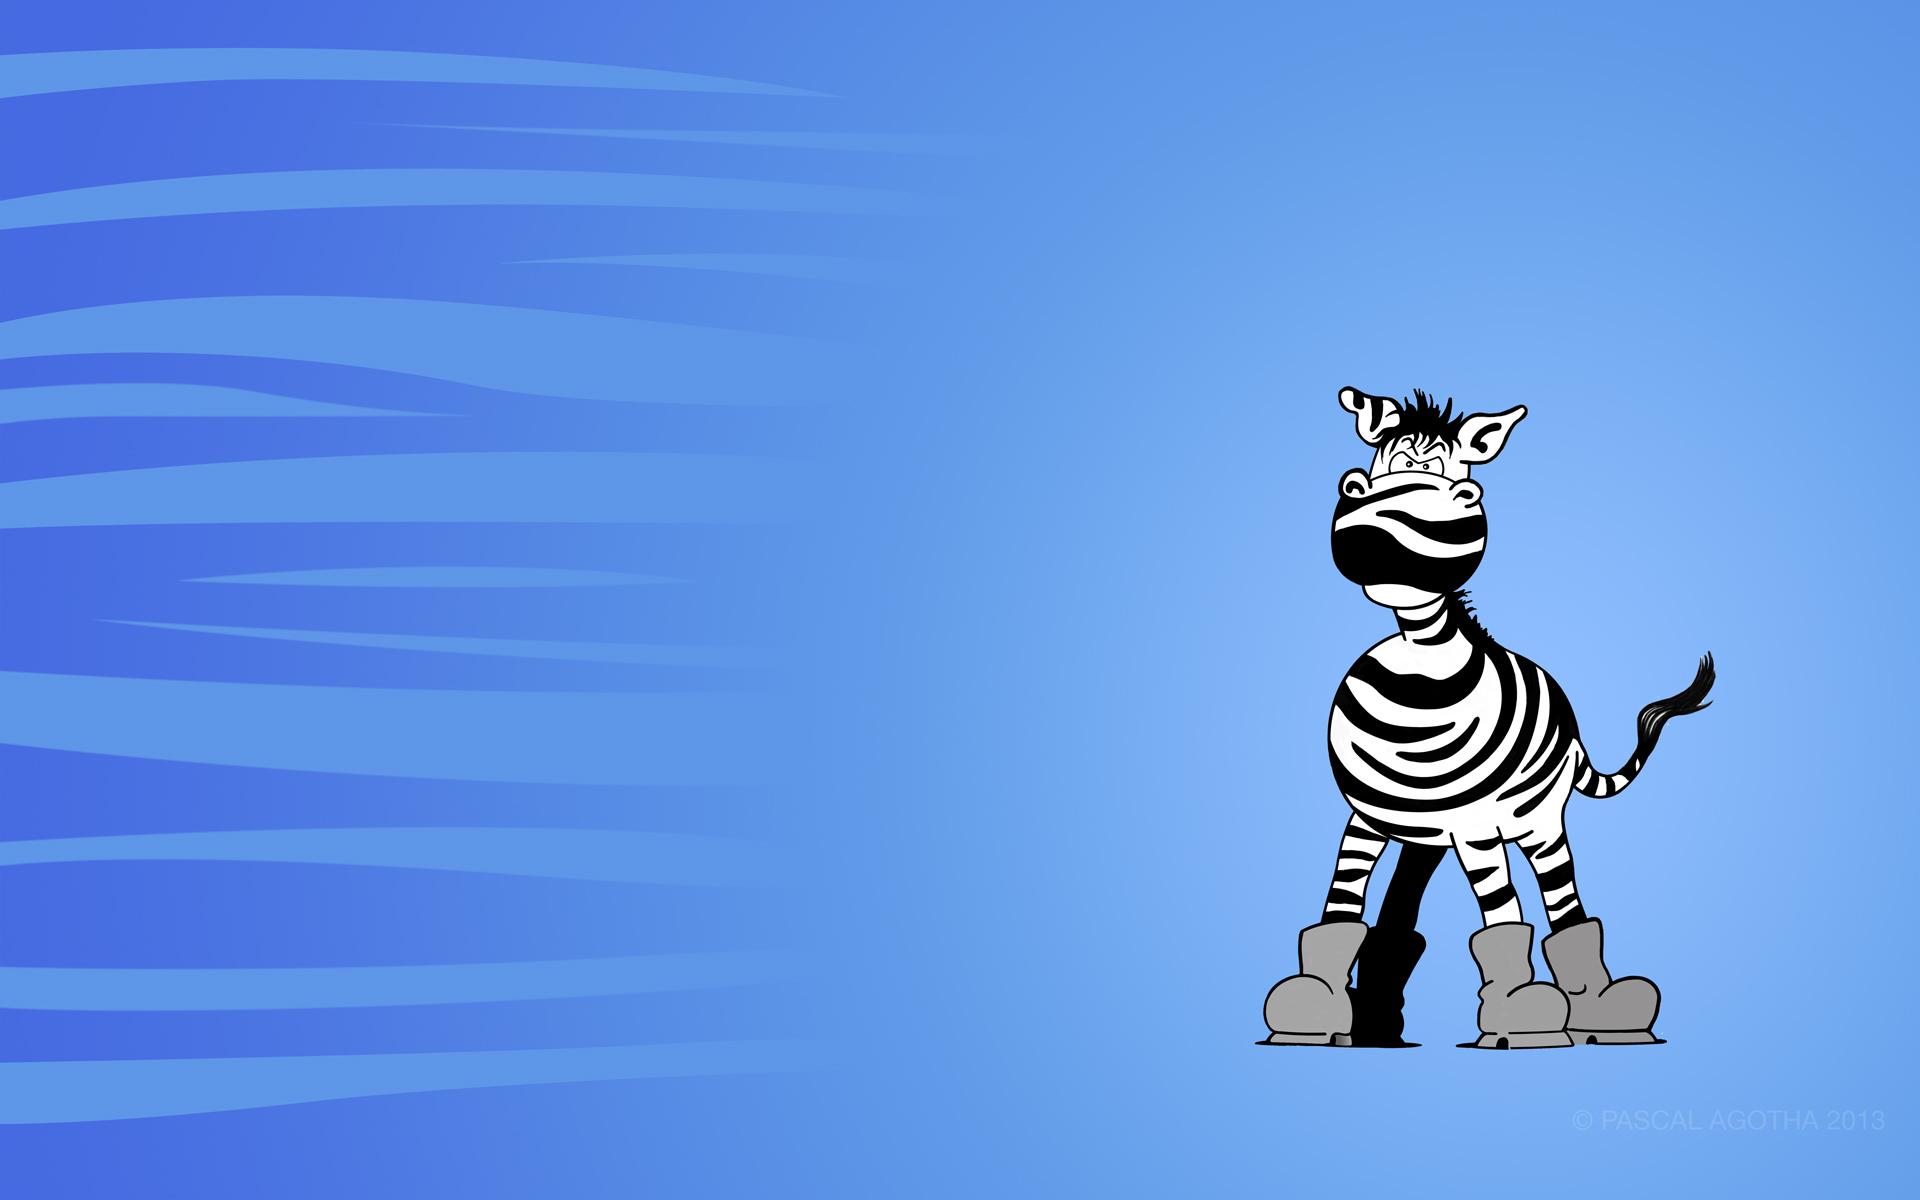 Zebra wallpaper   908360 1920x1200